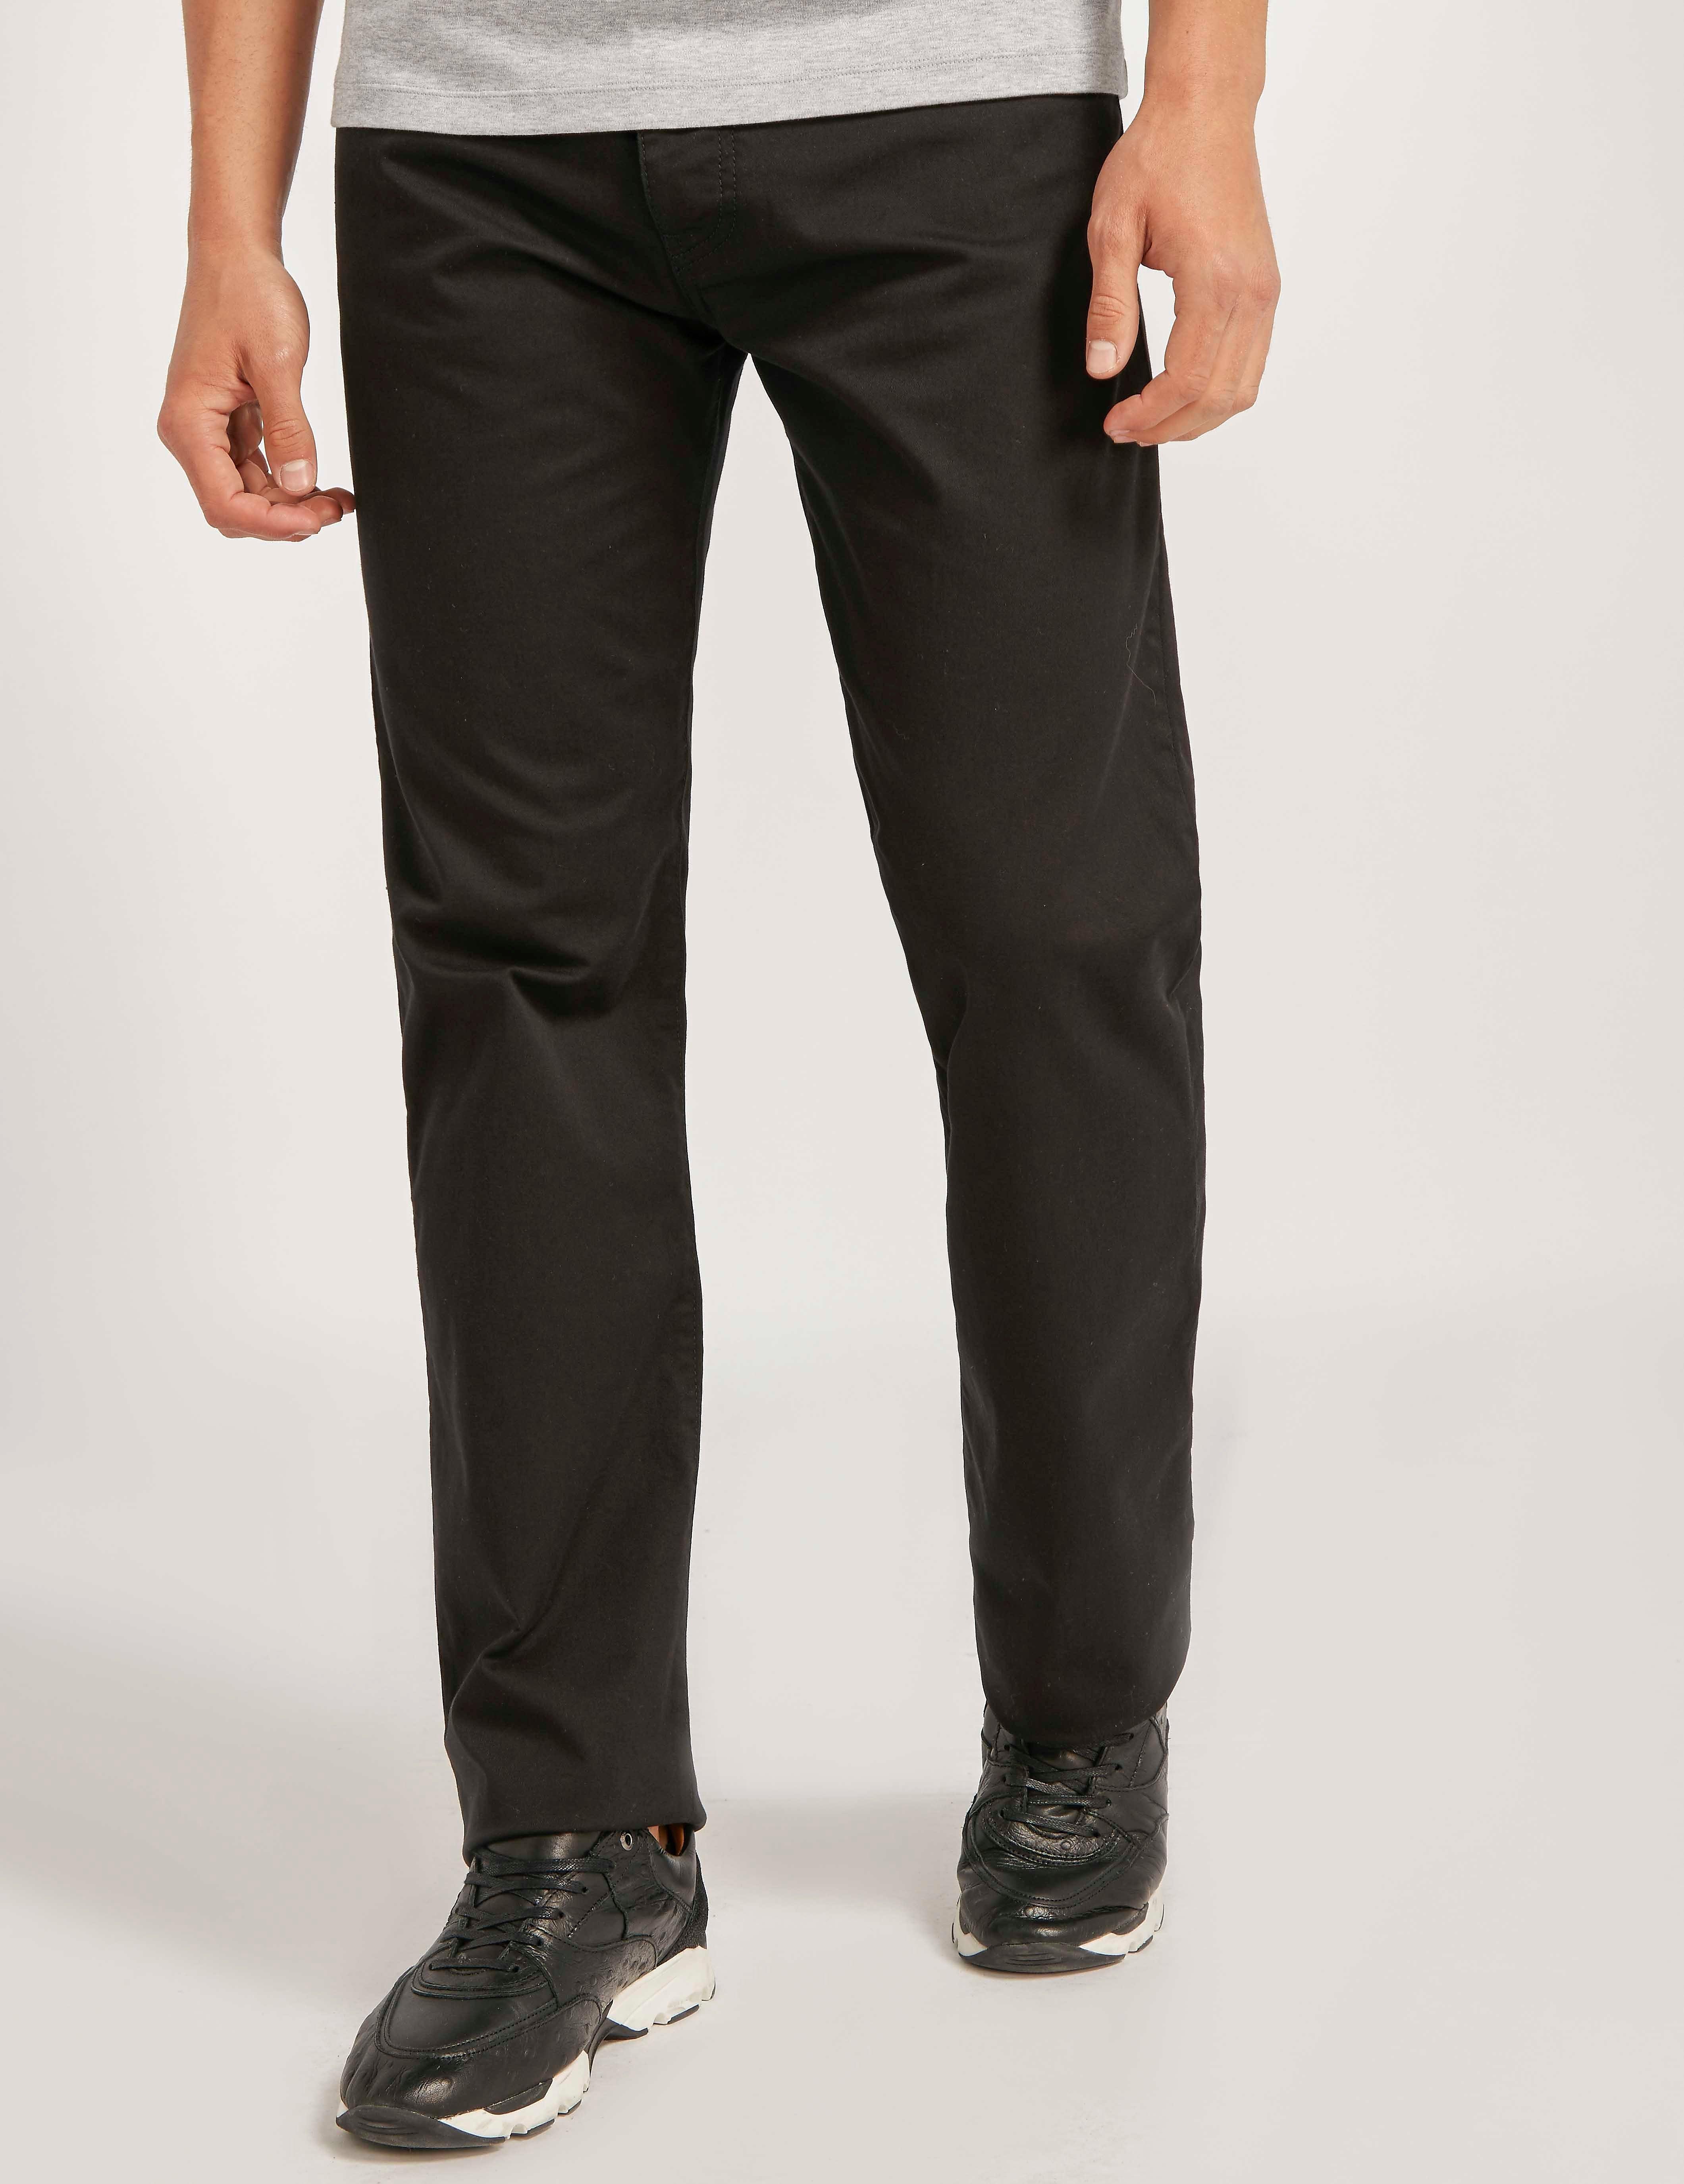 Armani Jeans J21 Gaberdine Jean - Long length